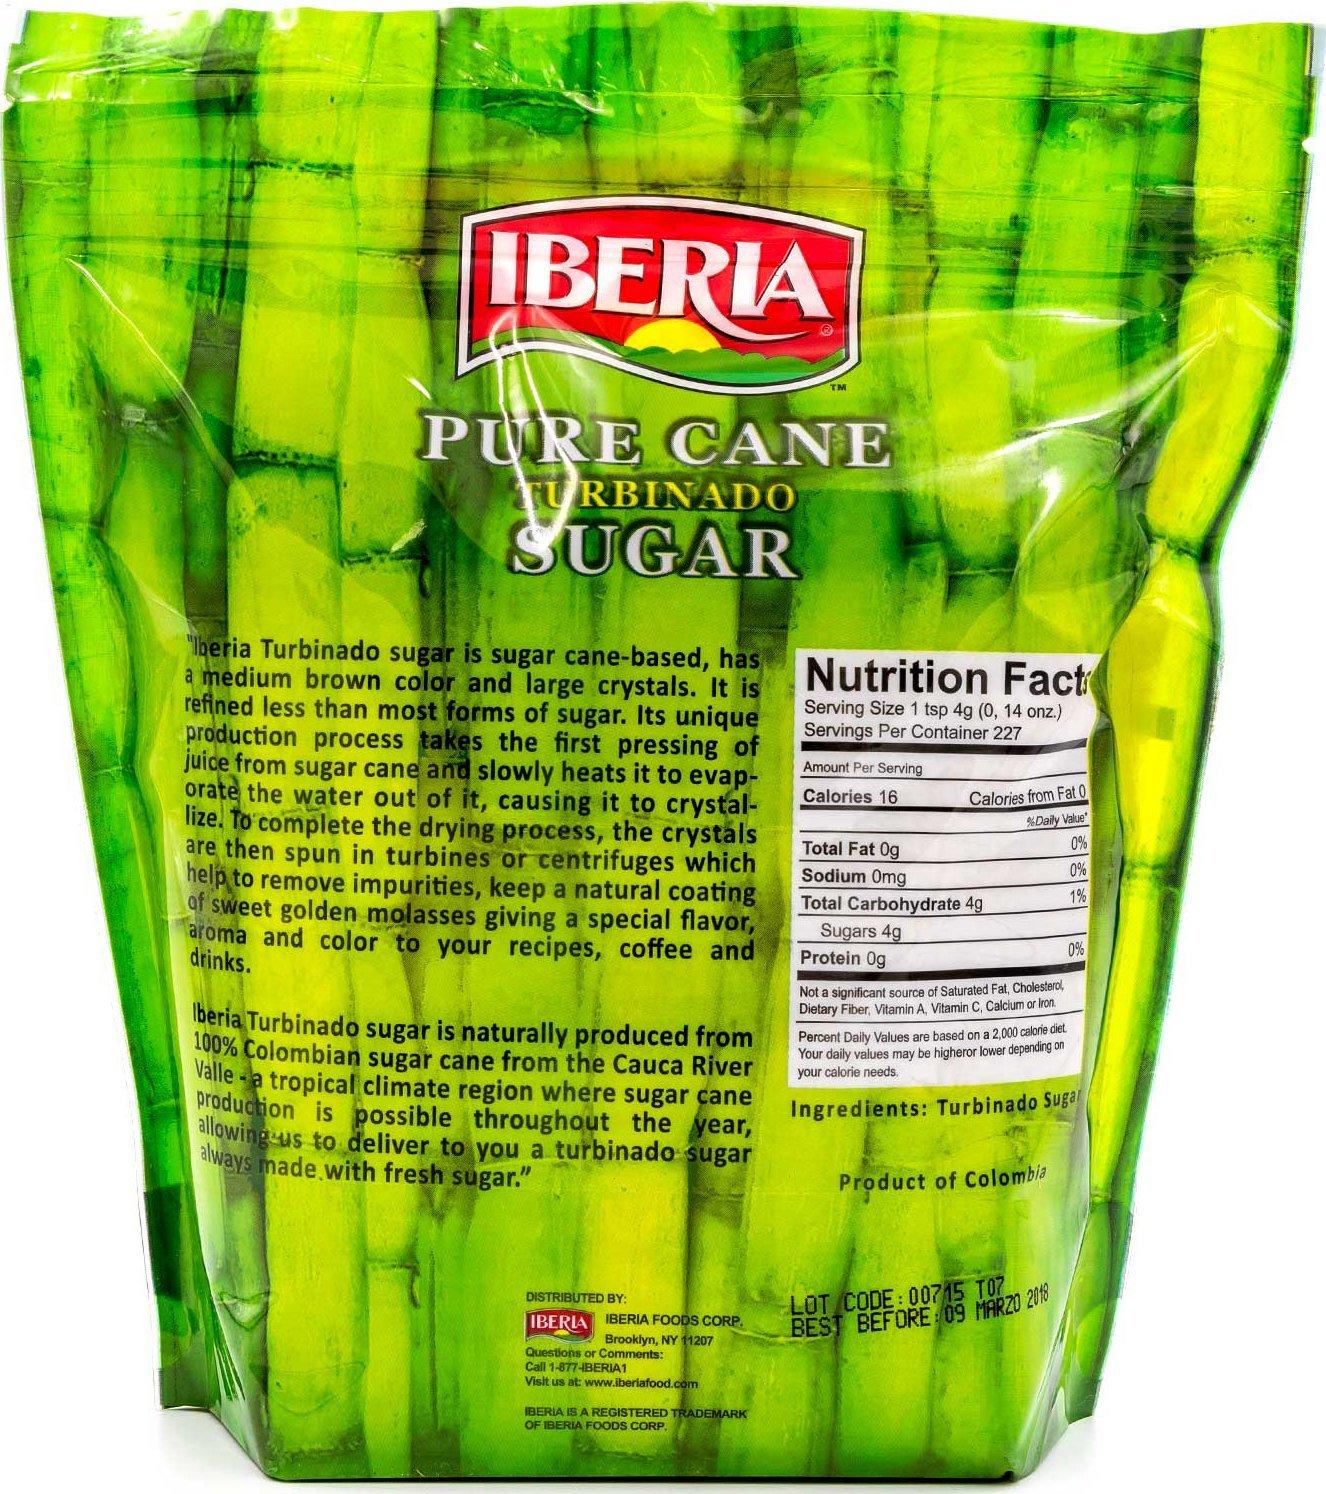 Amazon.com : Iberia Pure Cane Turbinado Raw Sugar 2lb : Grocery & Gourmet Food